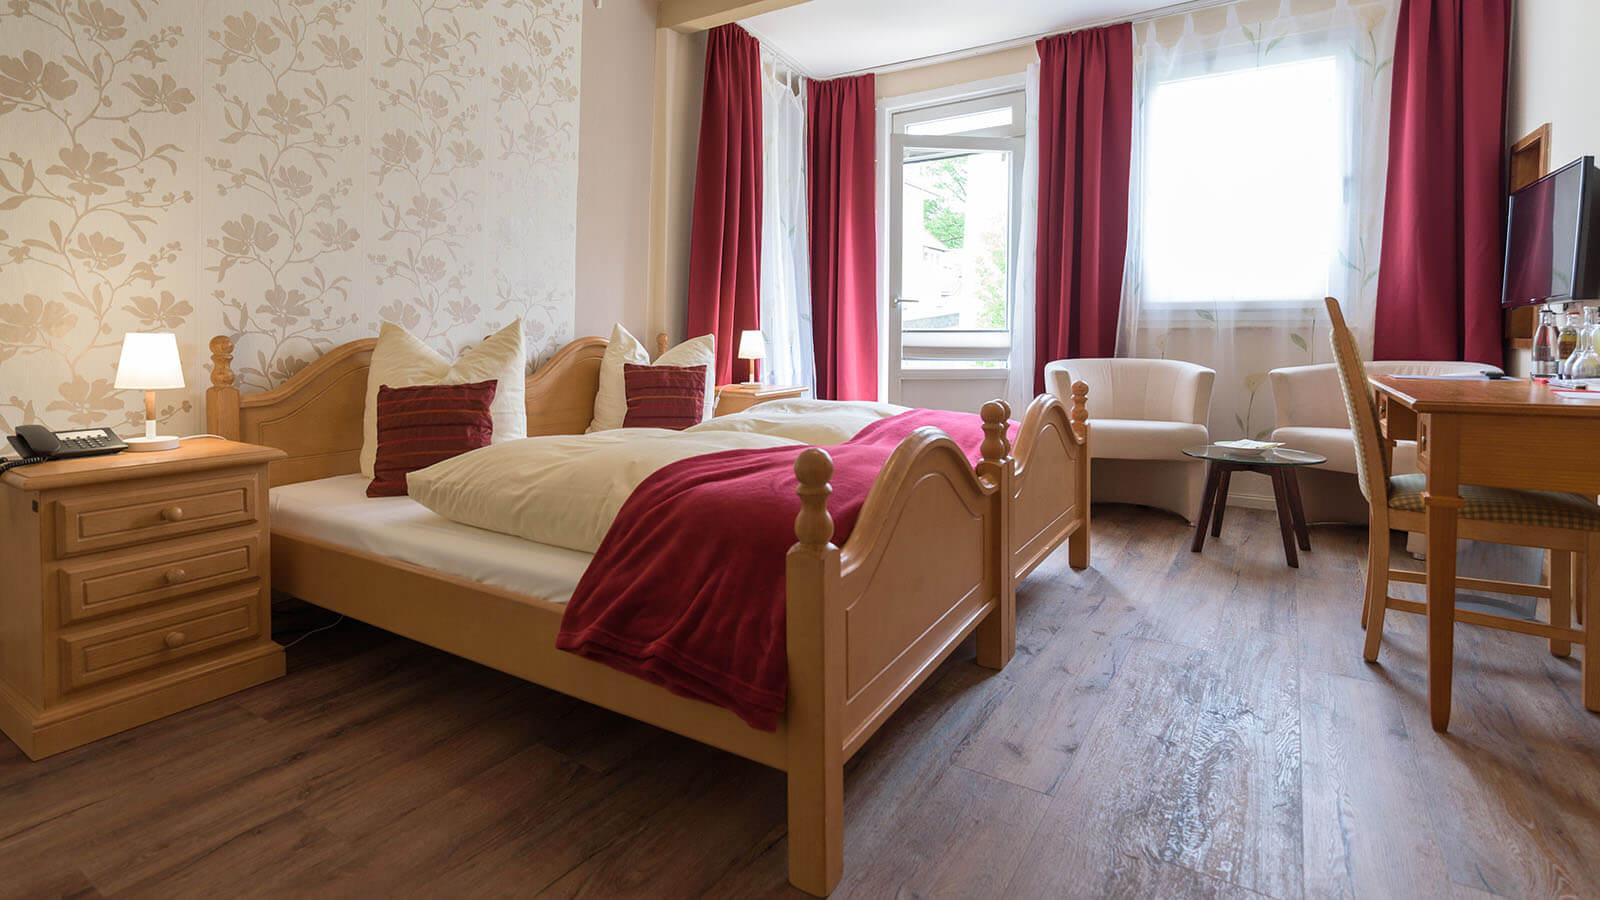 Doppelzimmer im Hotel Goethe Haus